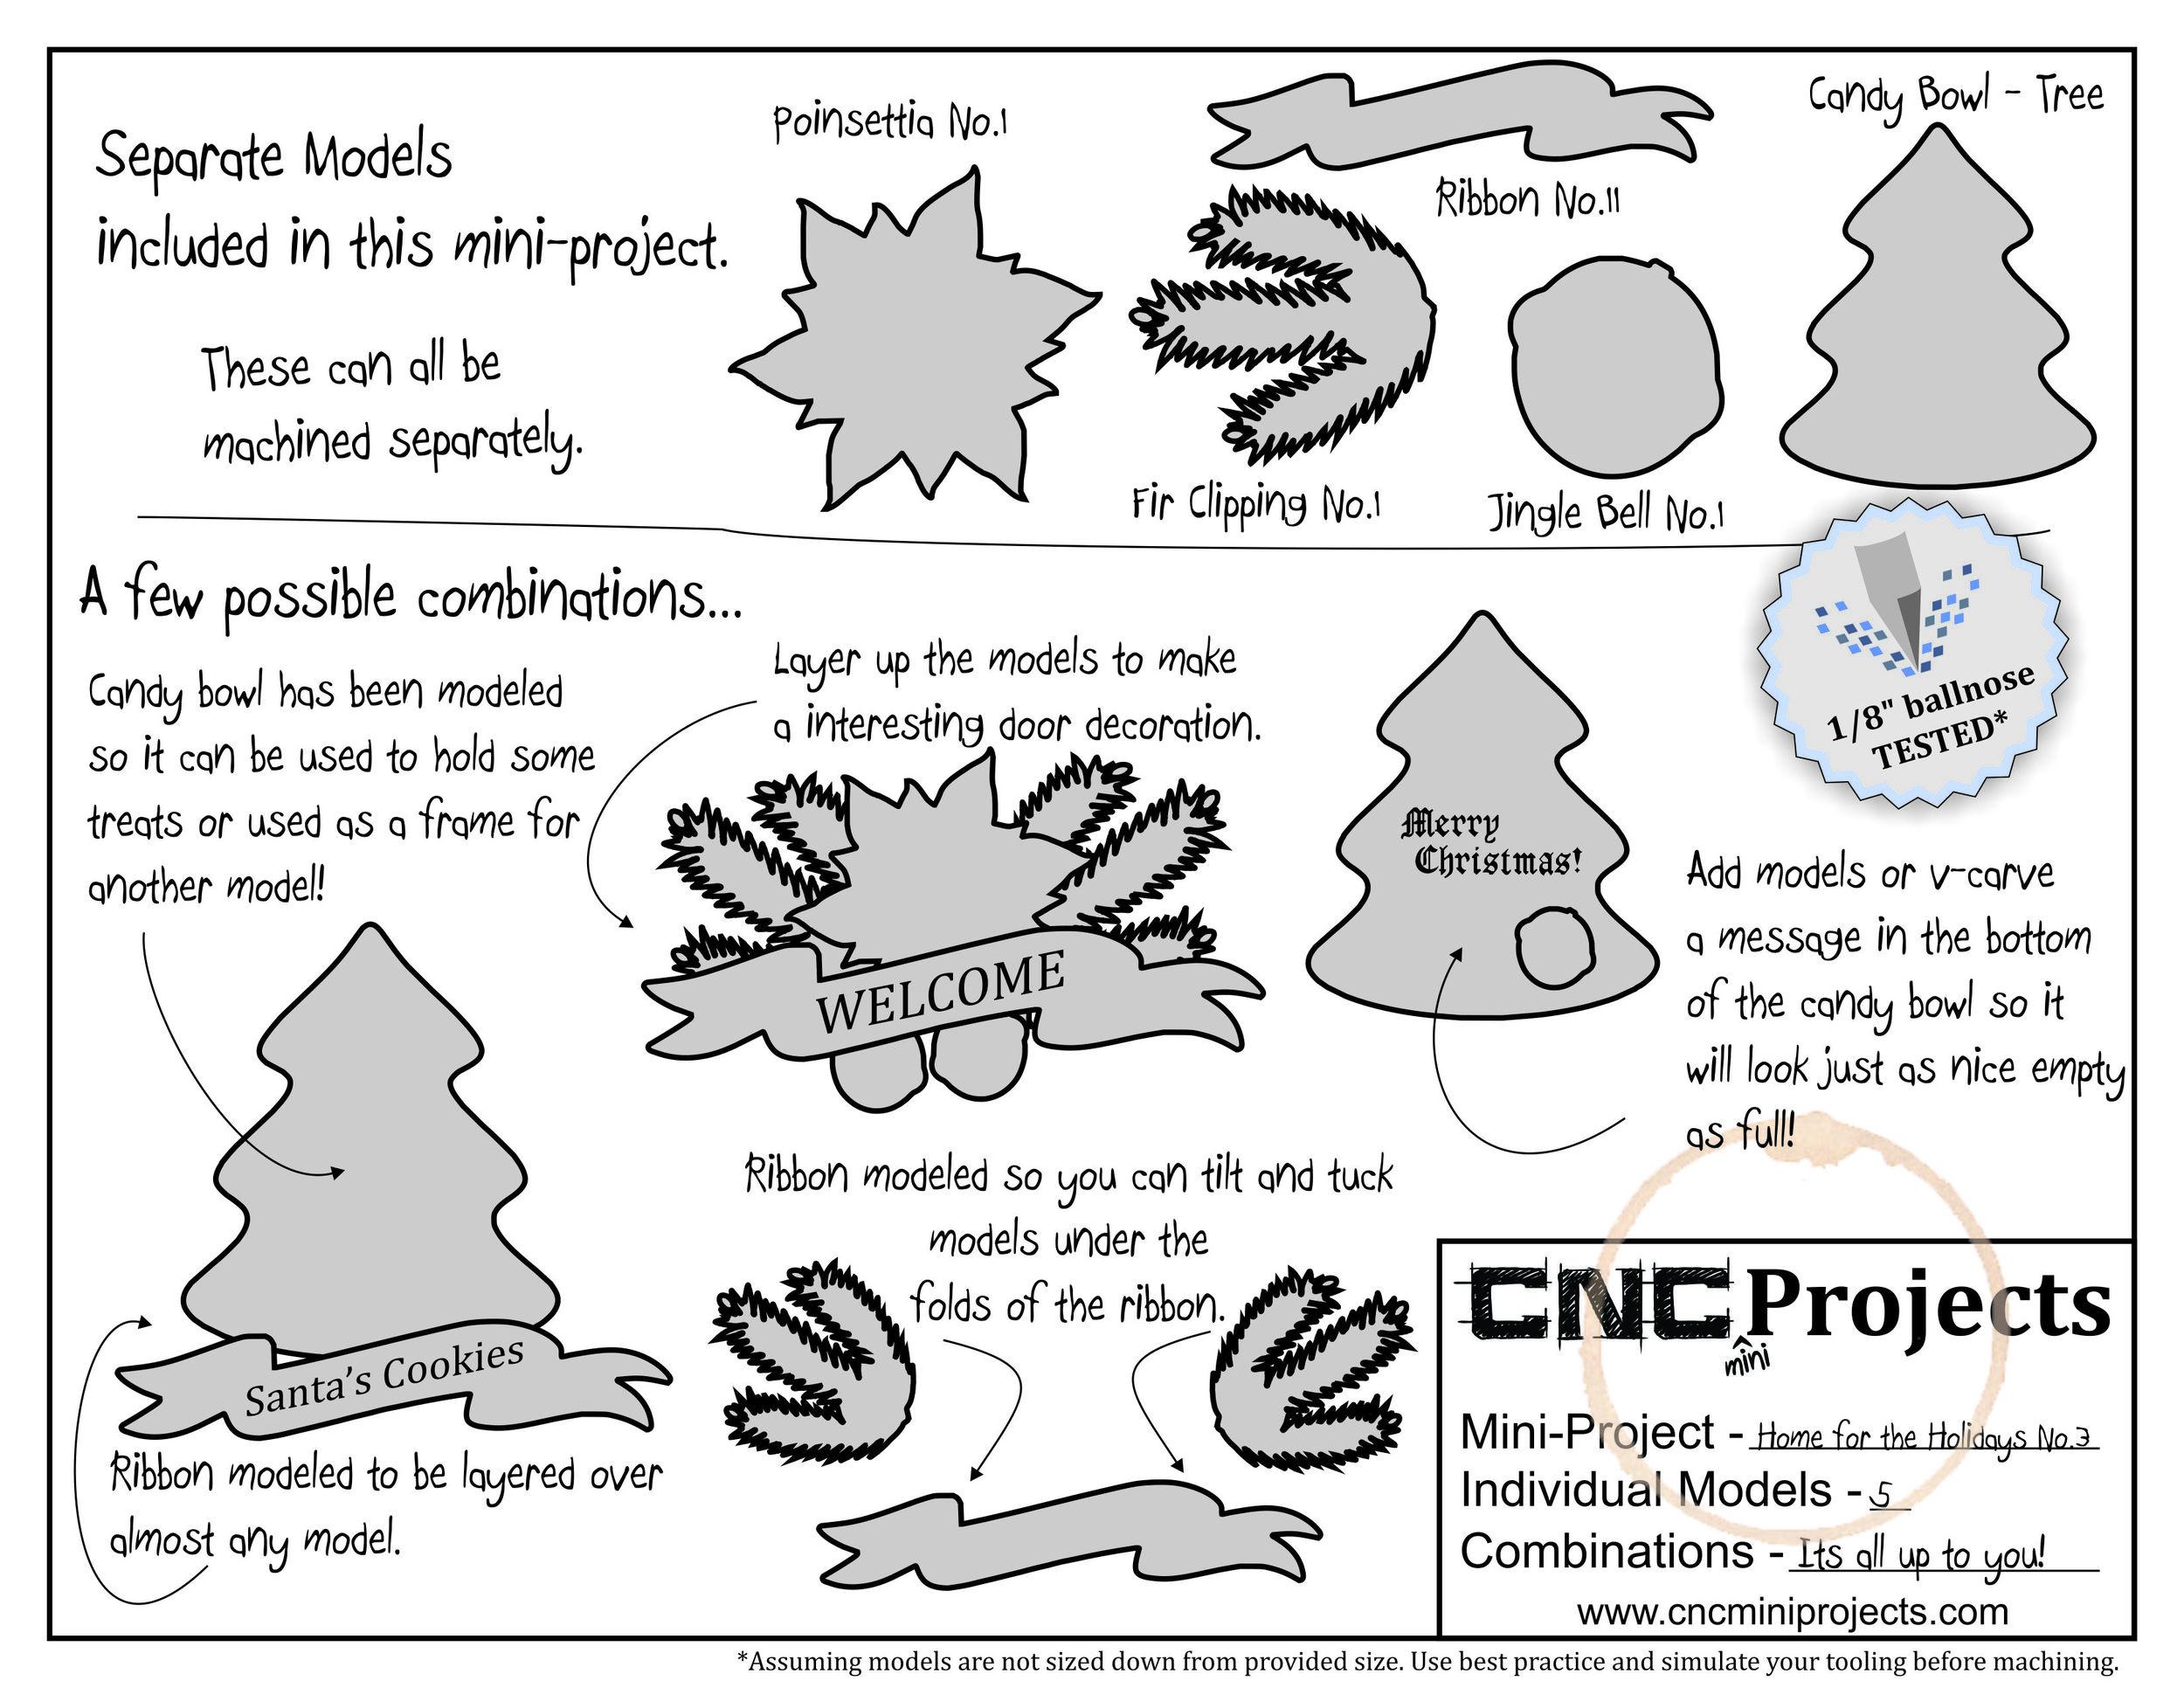 Project Sheet